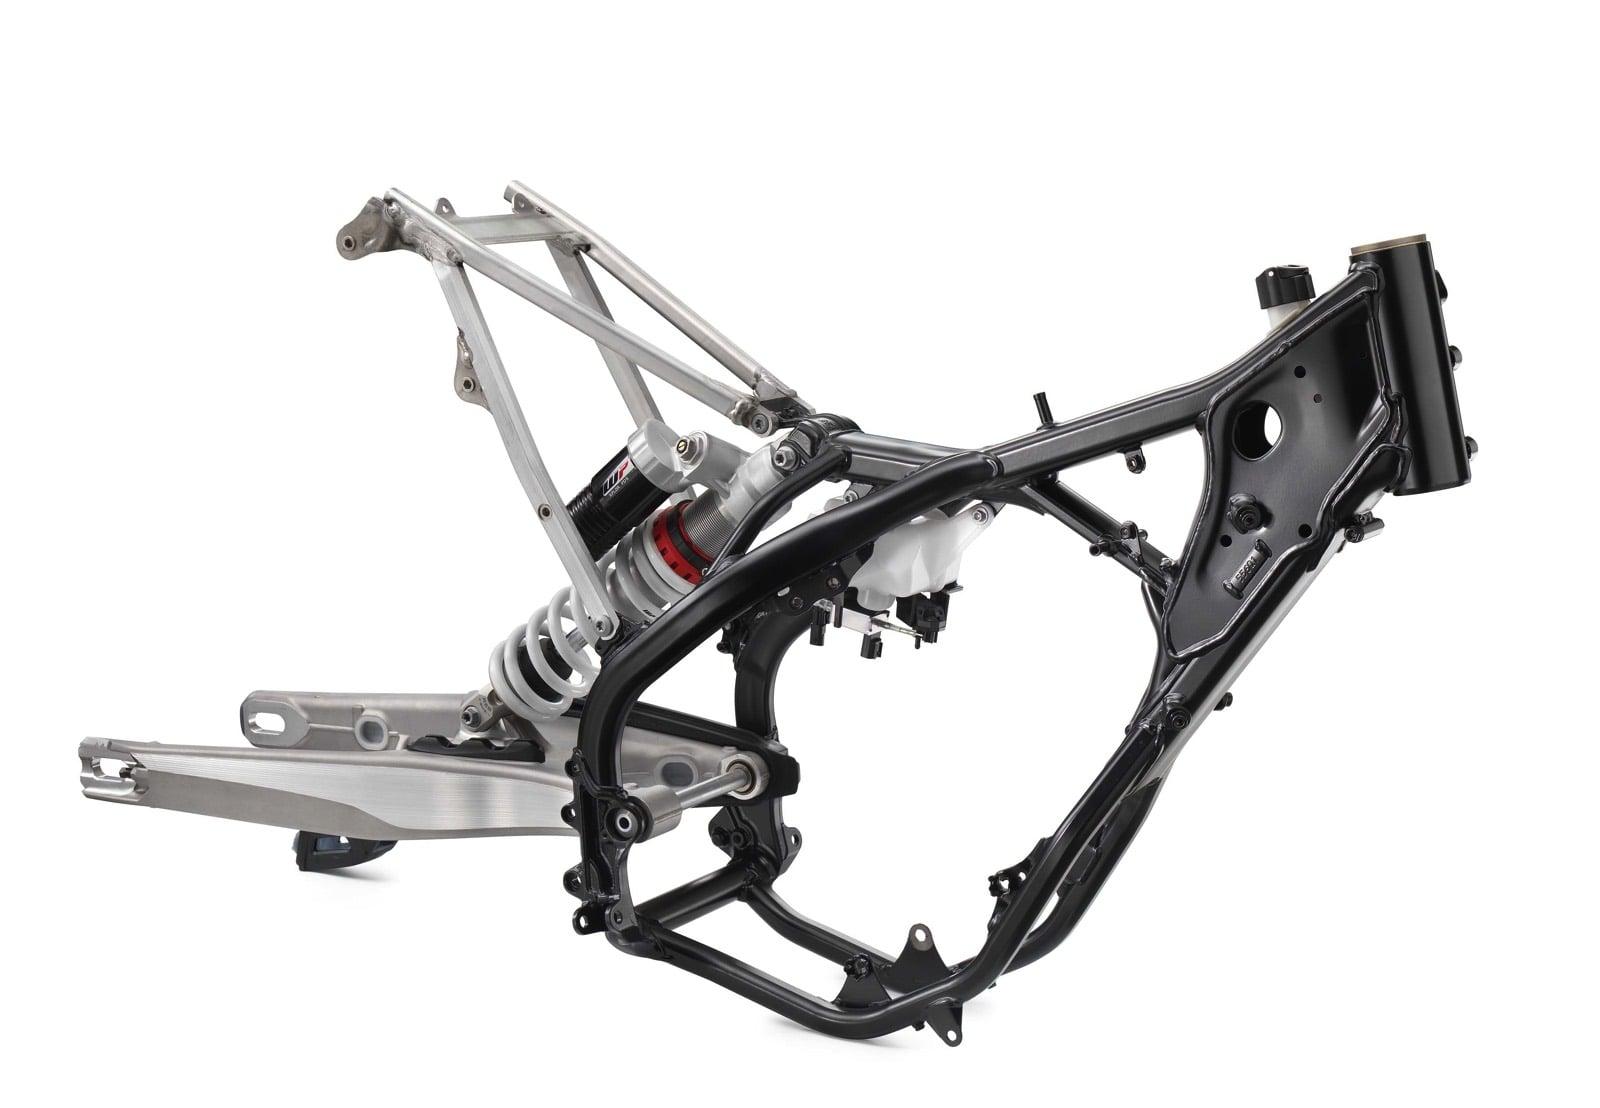 2018 KTM 250 300 EXC TPI 19 copy